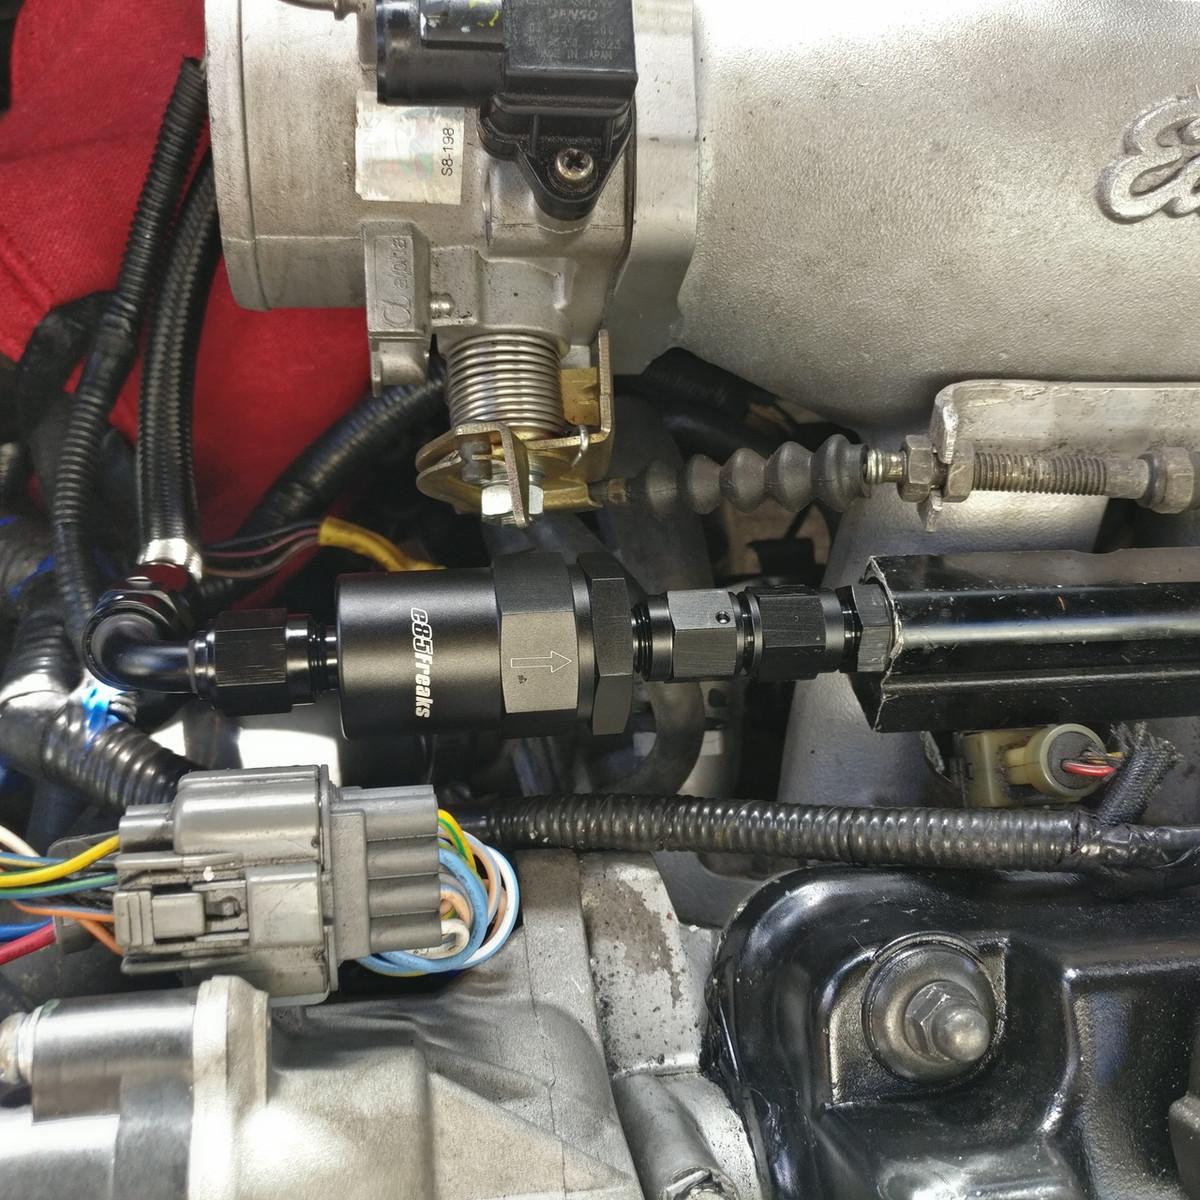 jbtuned honda ef civic da integra crx fuel line tuck kit  89 honda fuel filter replace #15